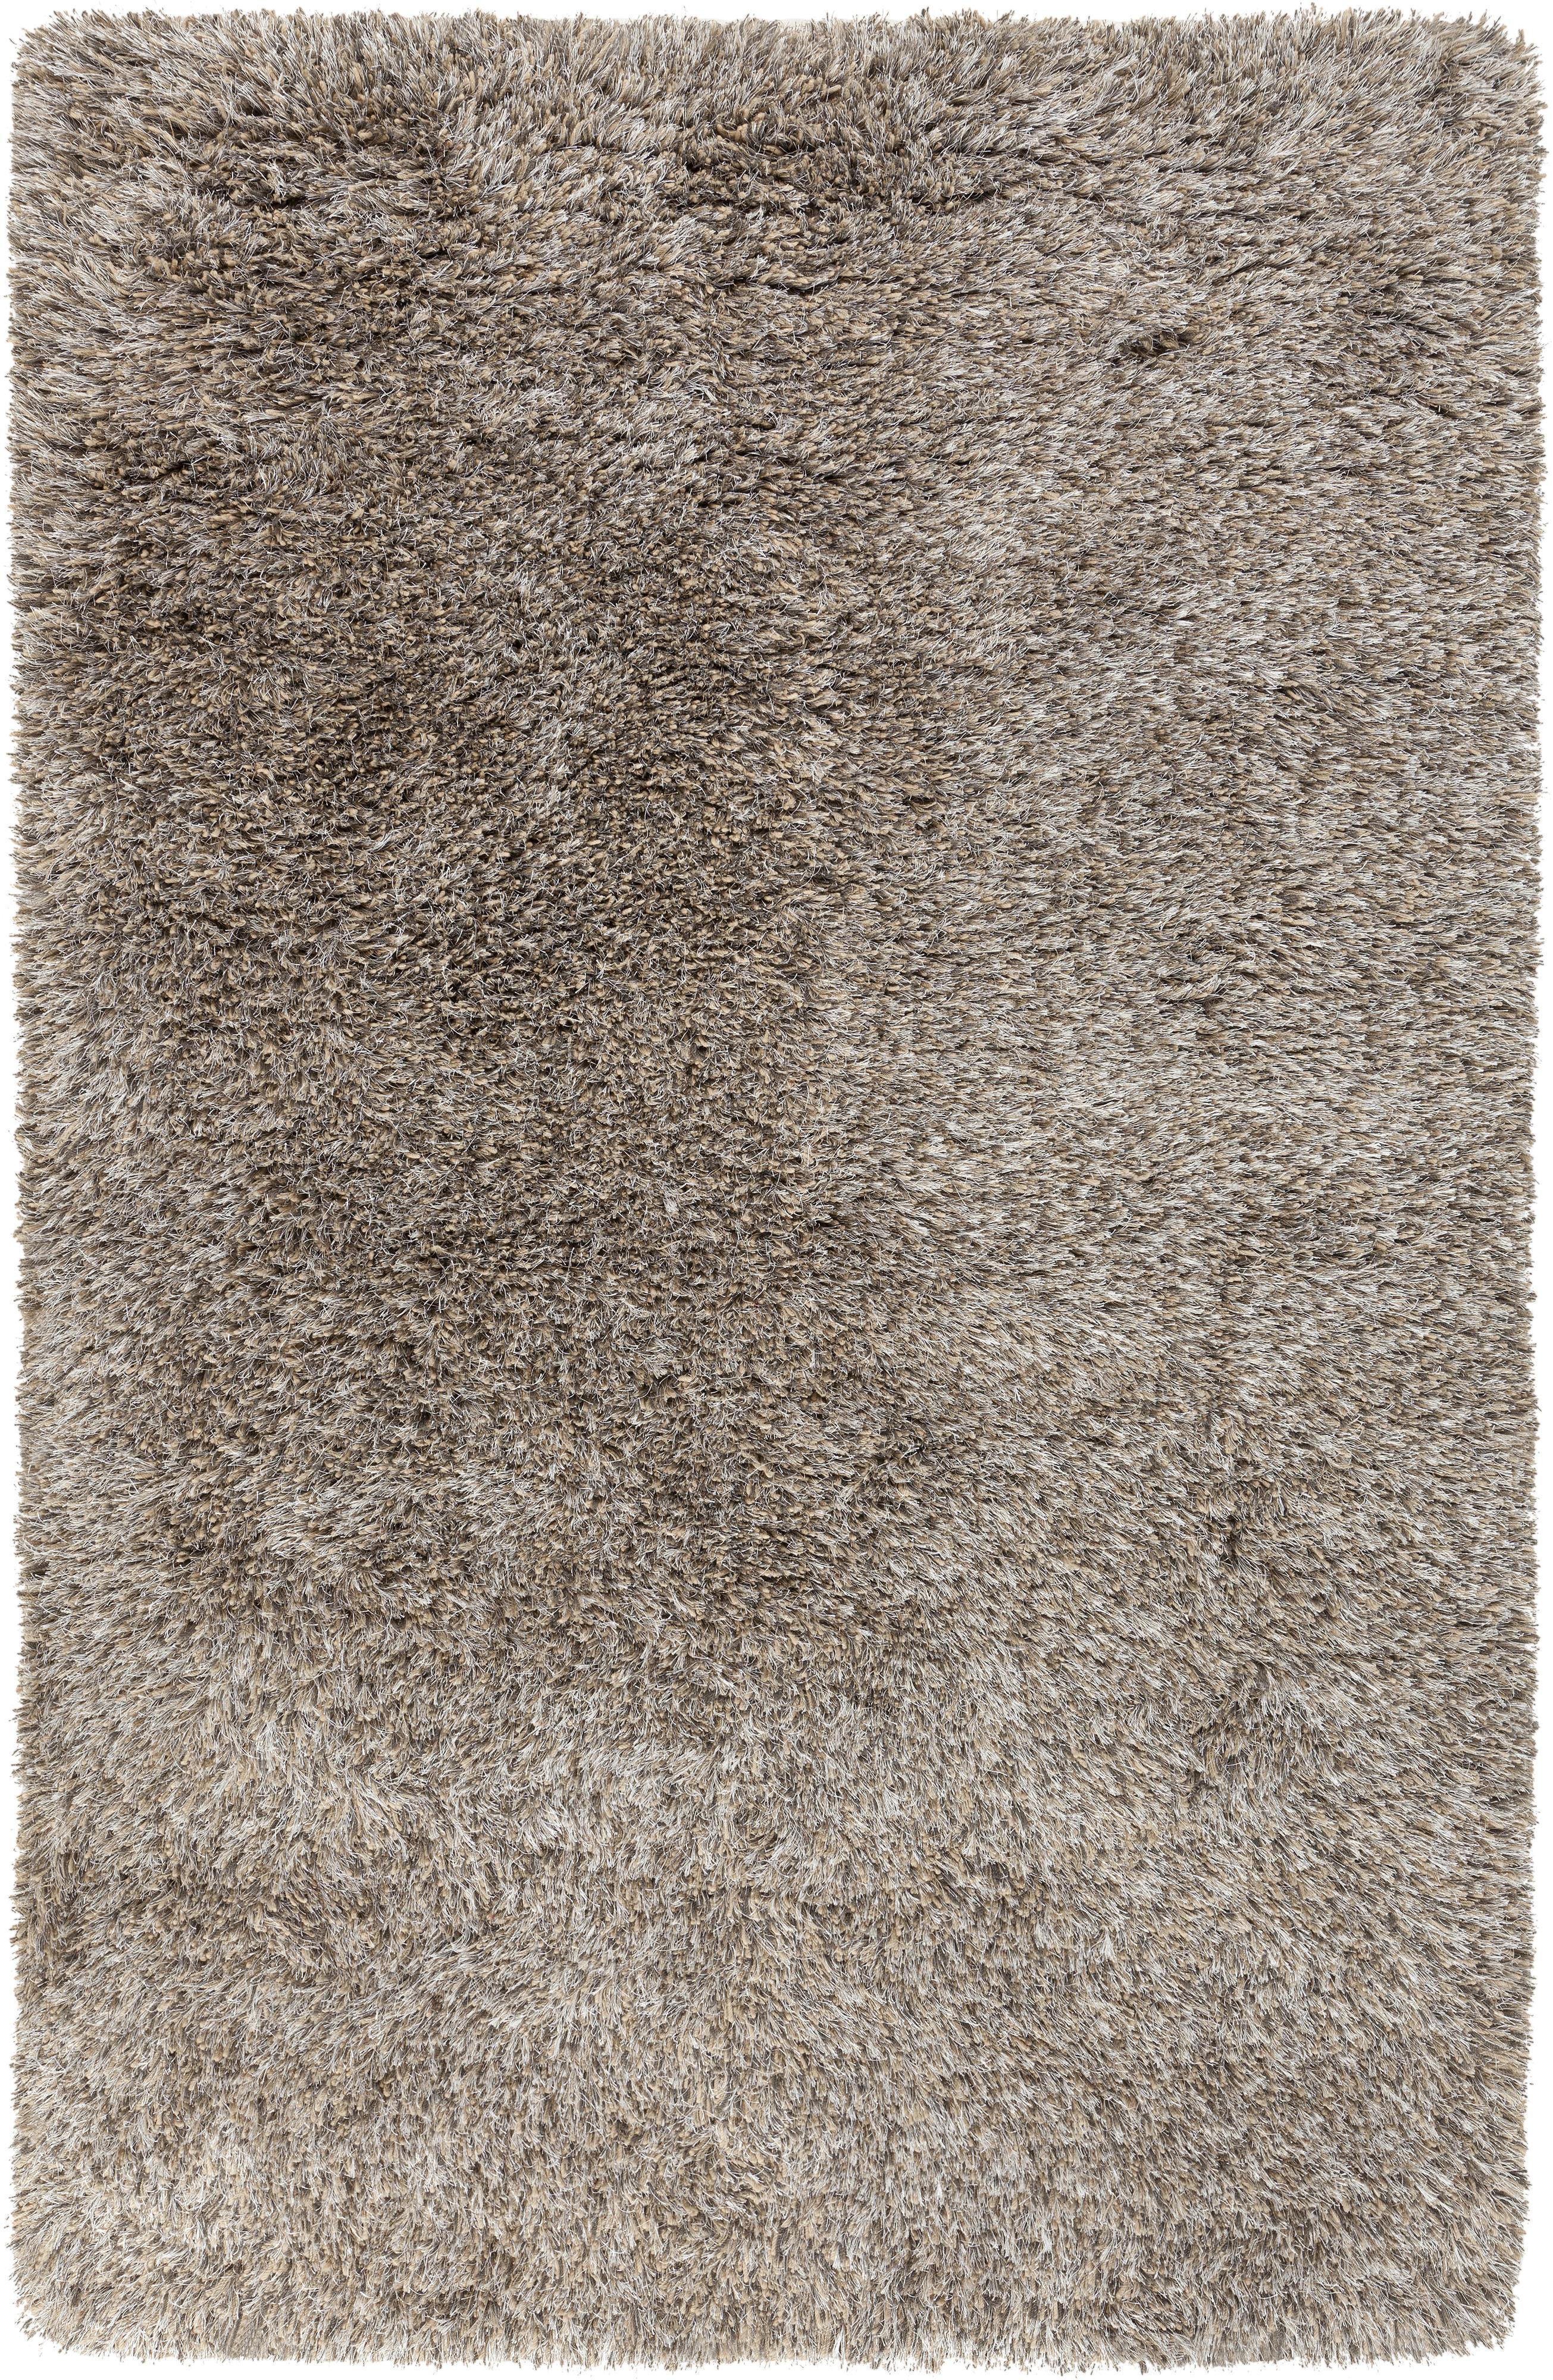 Surya Rugs Milan 9' x 13' - Item Number: MIL5002-913